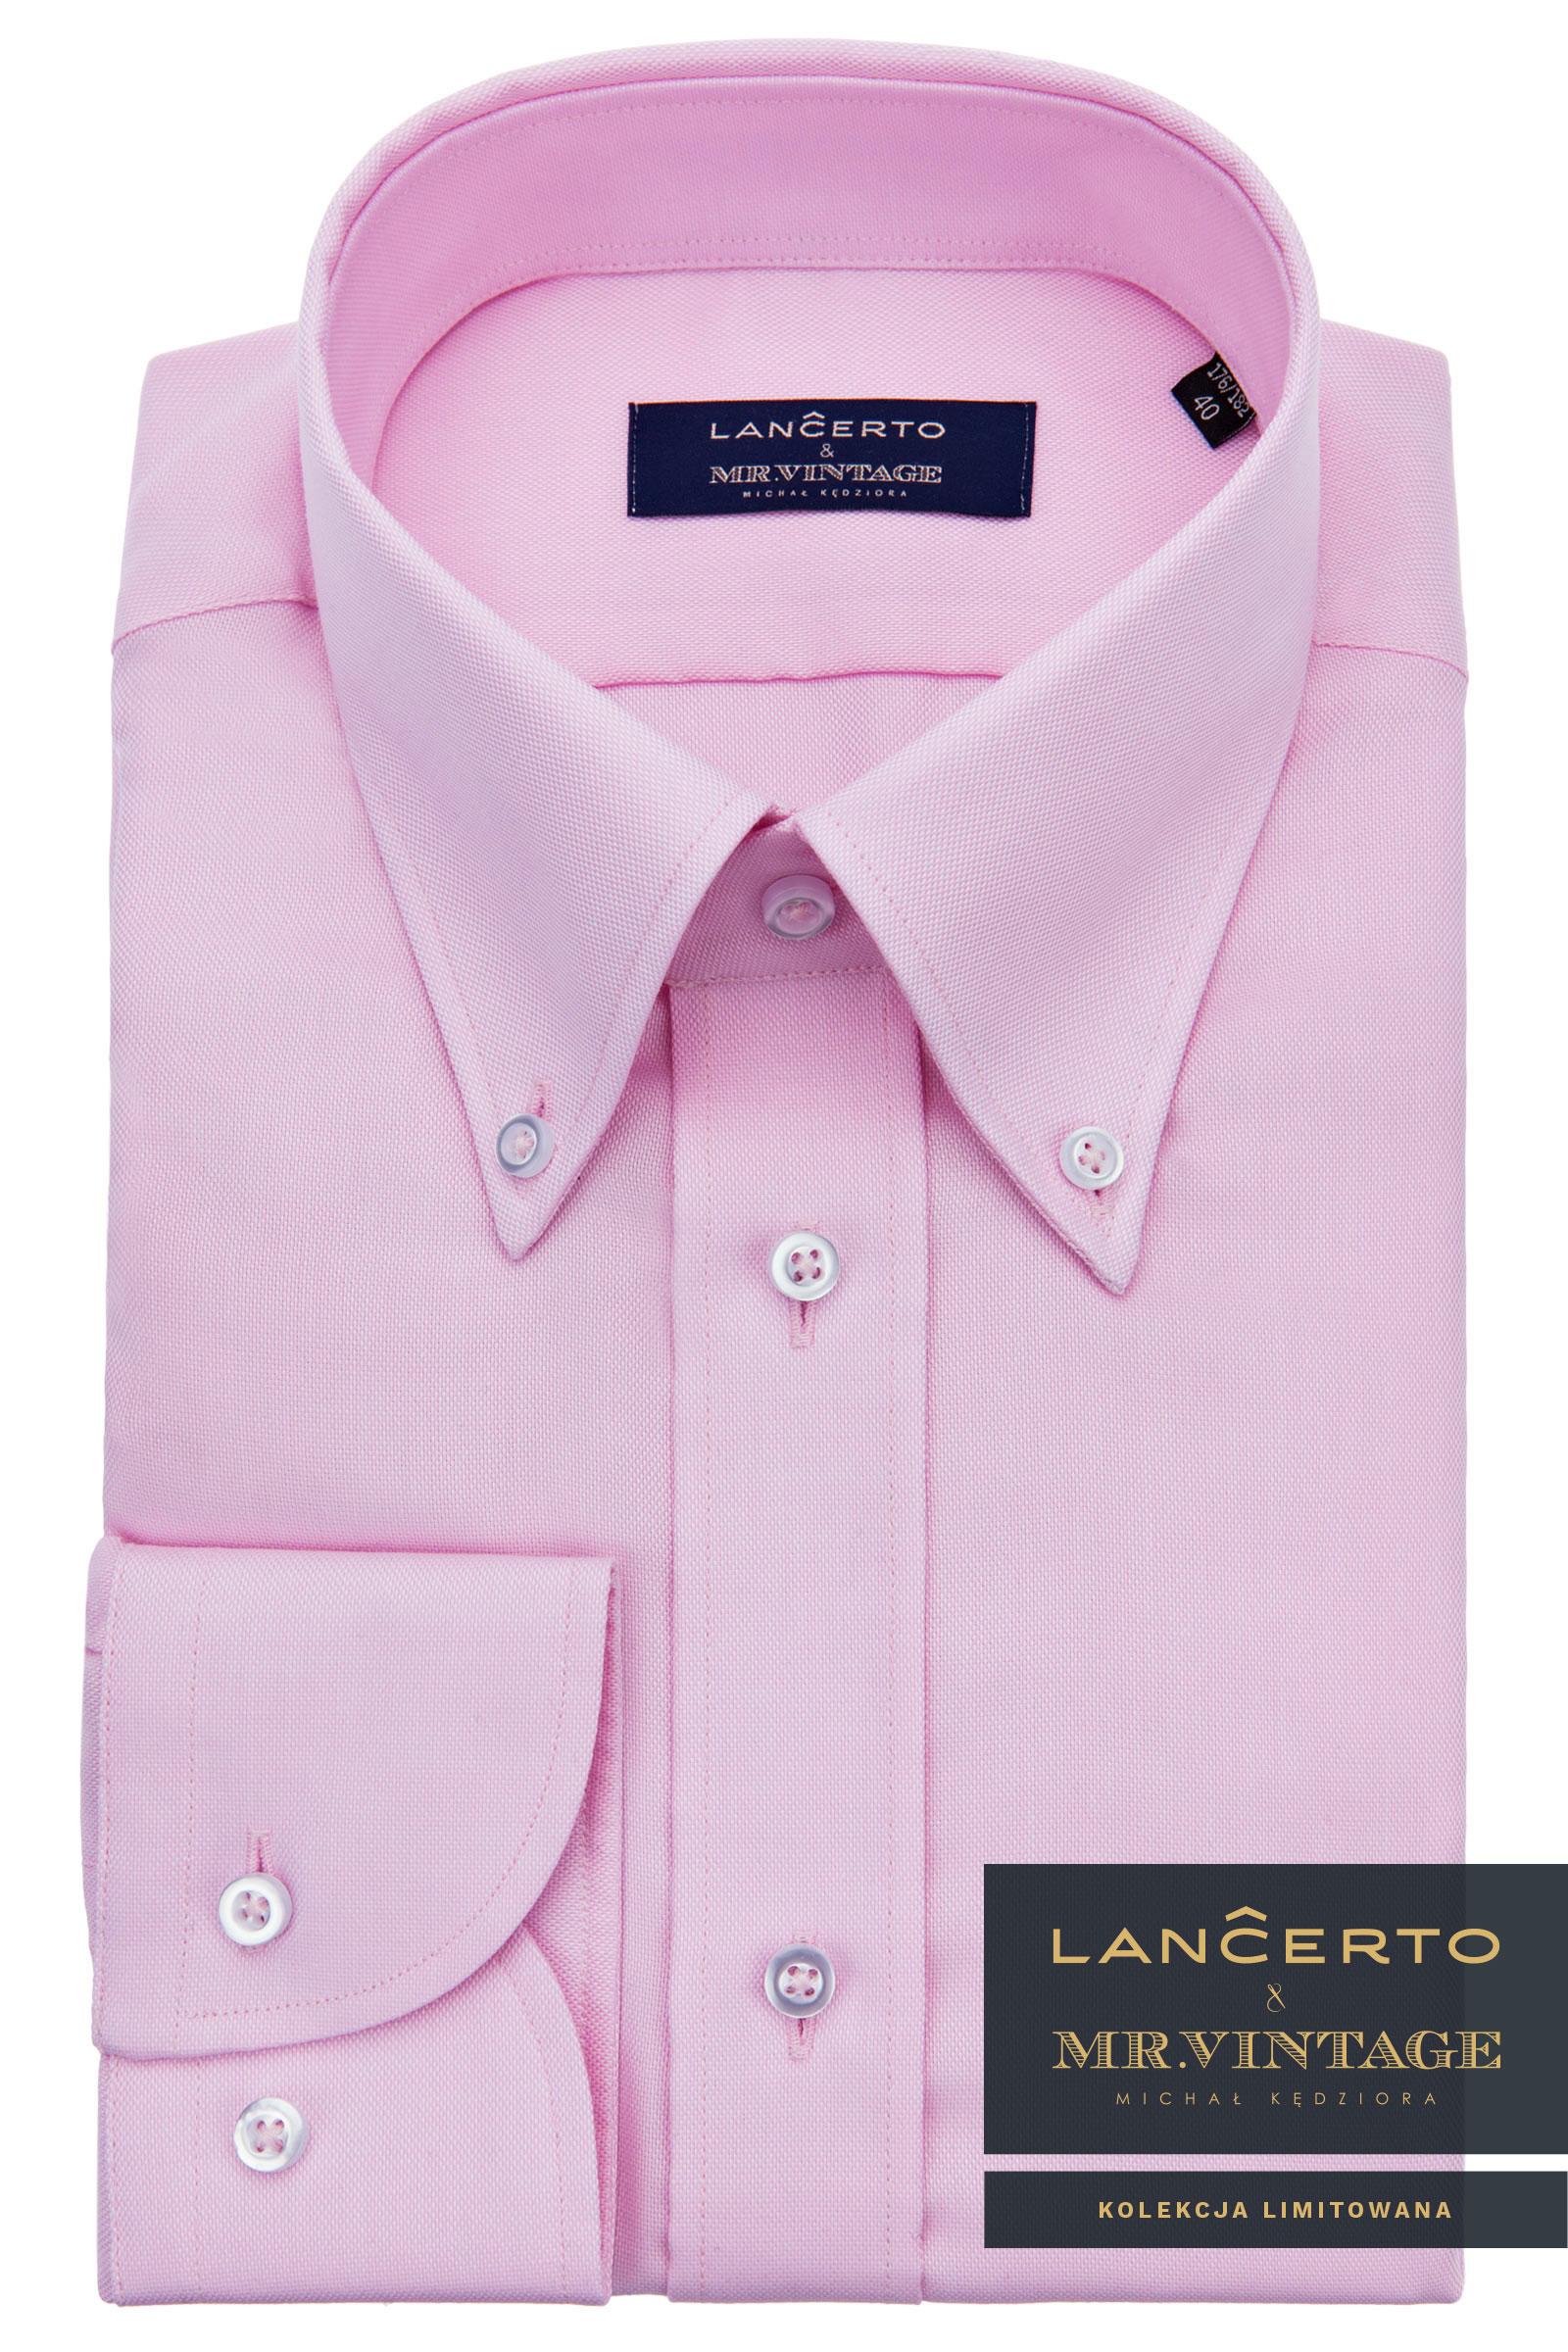 Lancerto tričko&Pán Vintage Most 176/39